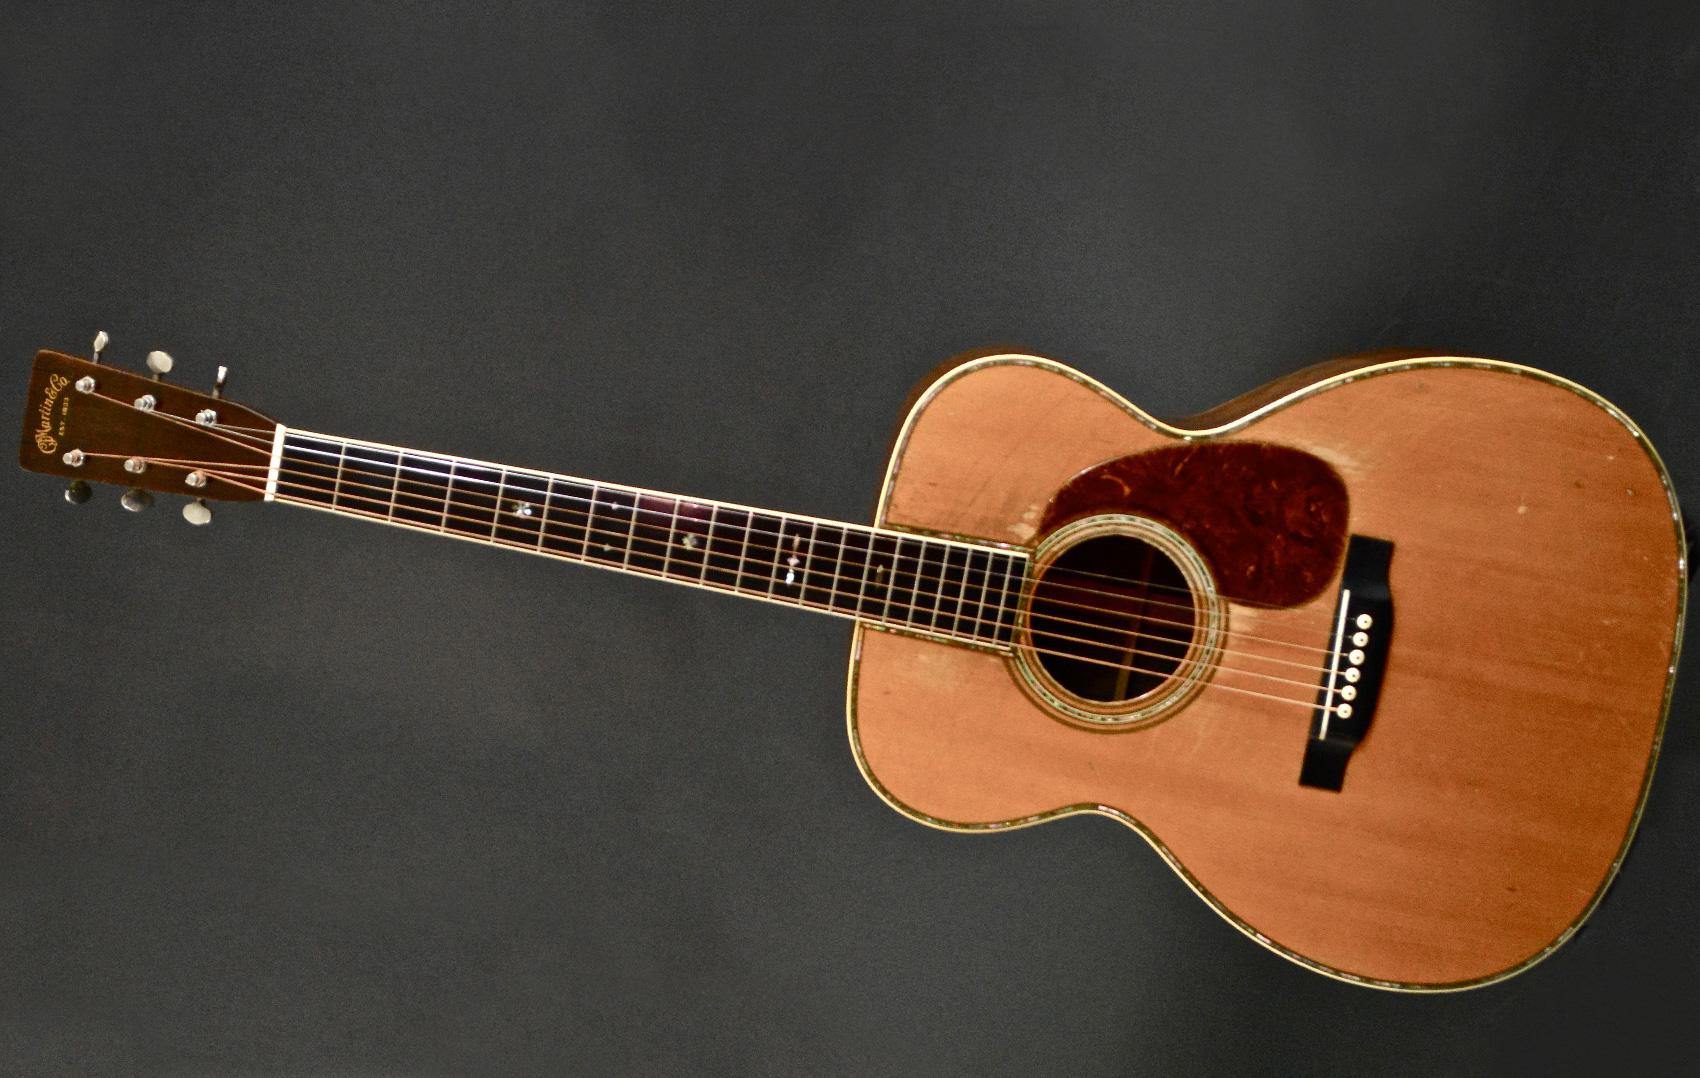 Eric Clapton unplugged 1939 Martin 000-42